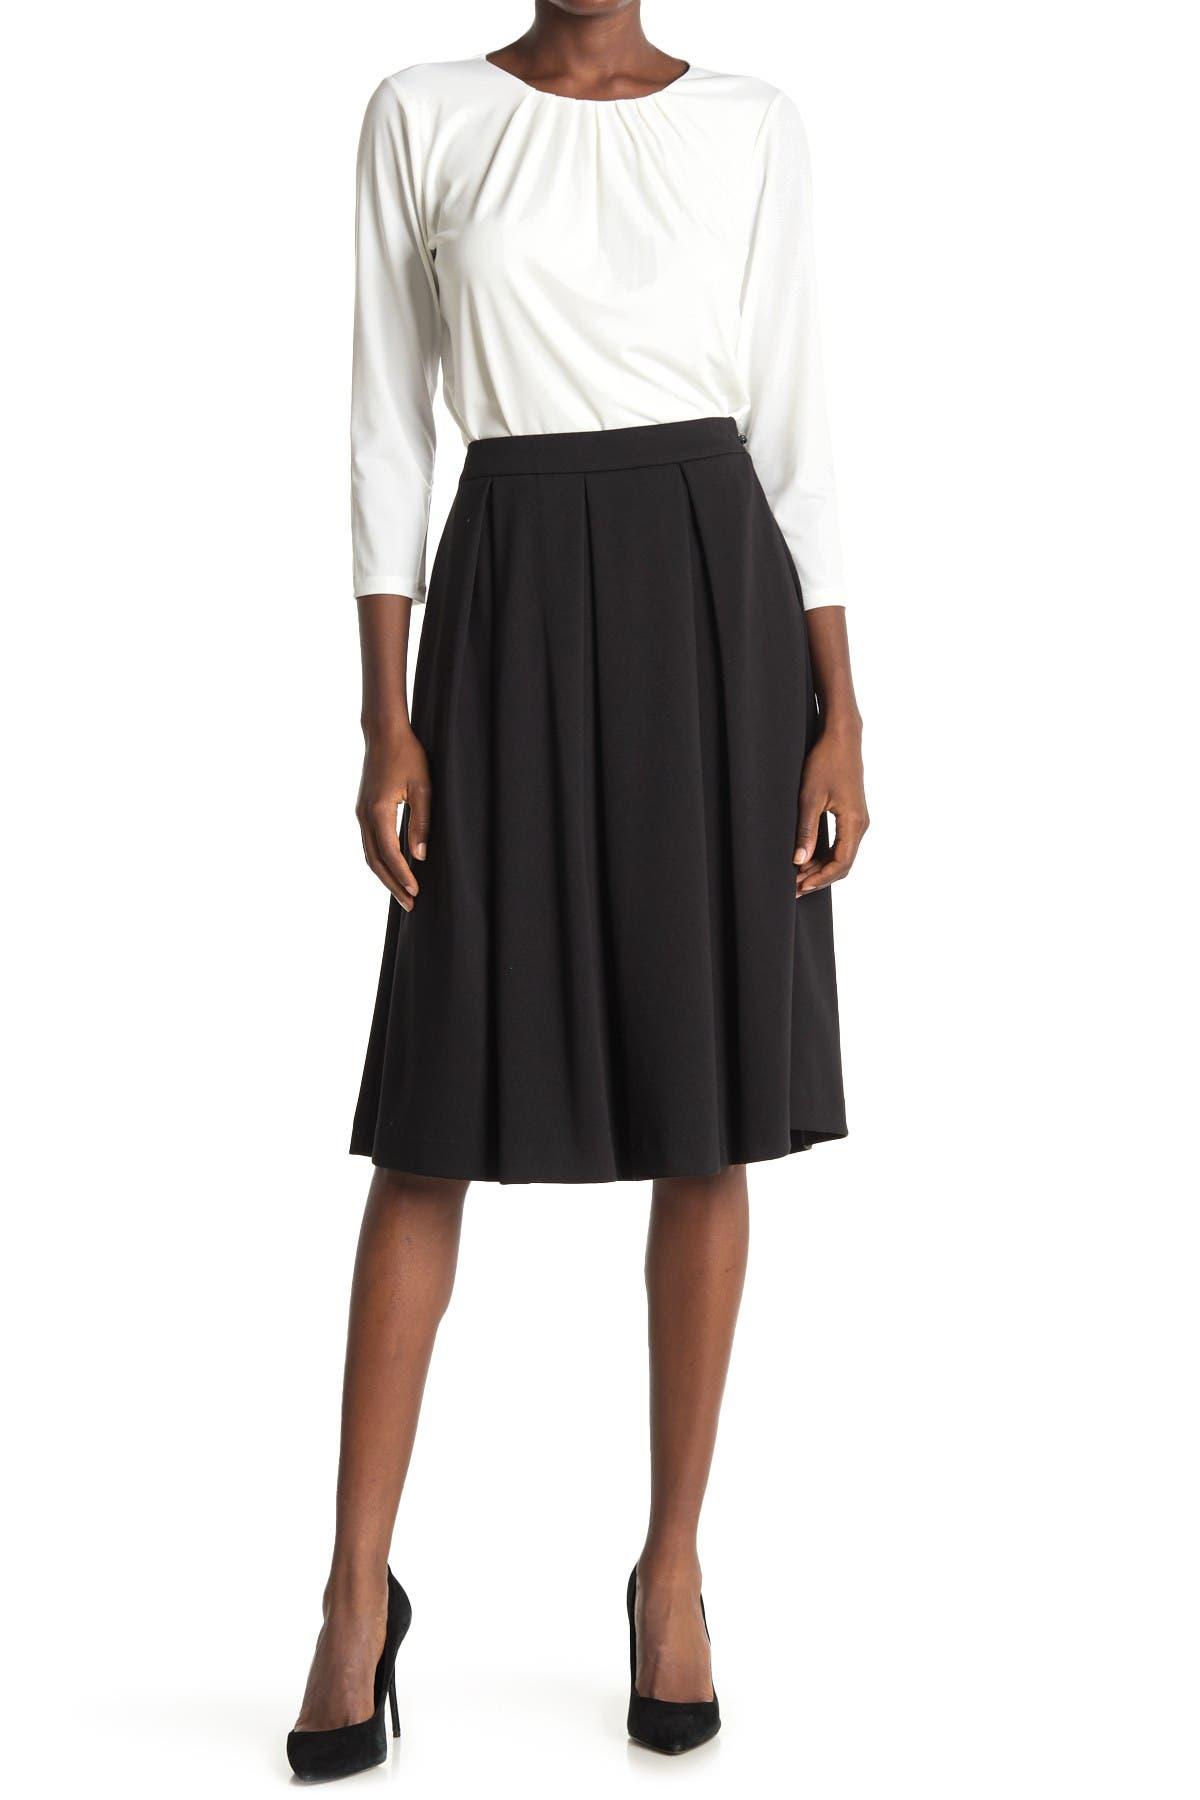 Image of Calvin Klein Midi Pleated Skirt